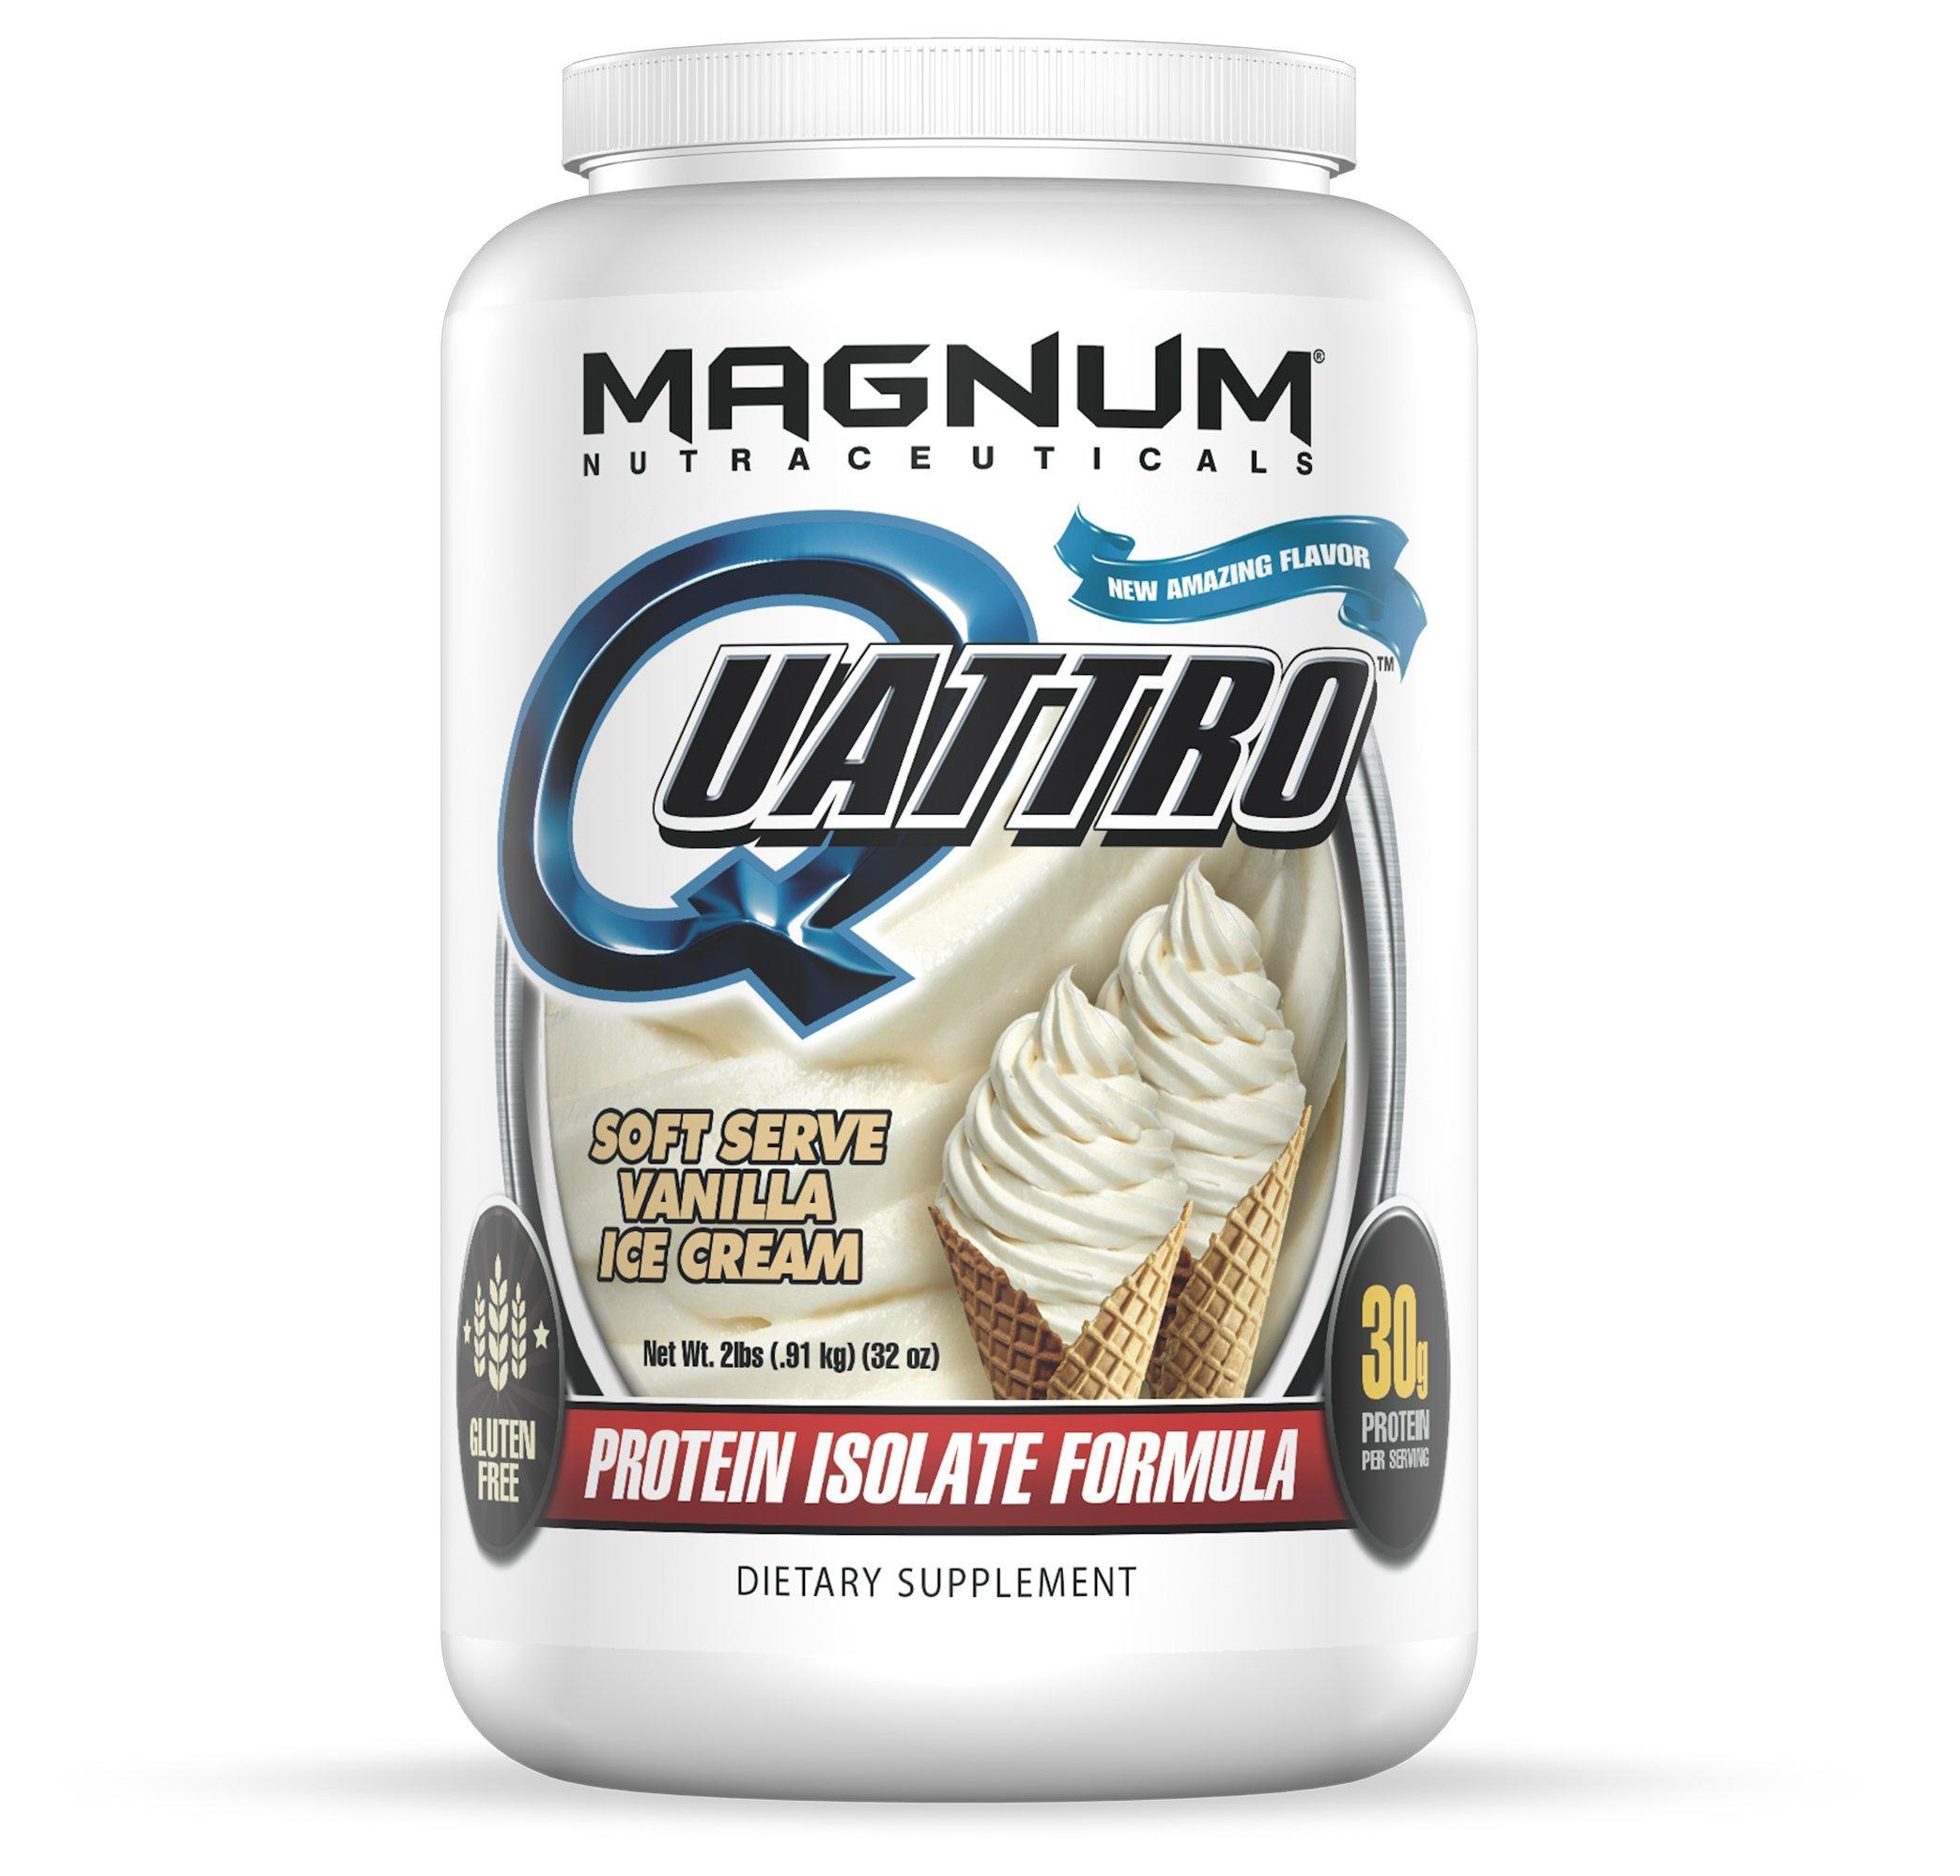 Magnum Nutraceuticals Quattro Protein Powder - 2lbs - Vanilla Ice Cream - Pharmaceutical Grade Protein Isolate - Lactose Free - Gluten Free - Peanut Free by Magnum